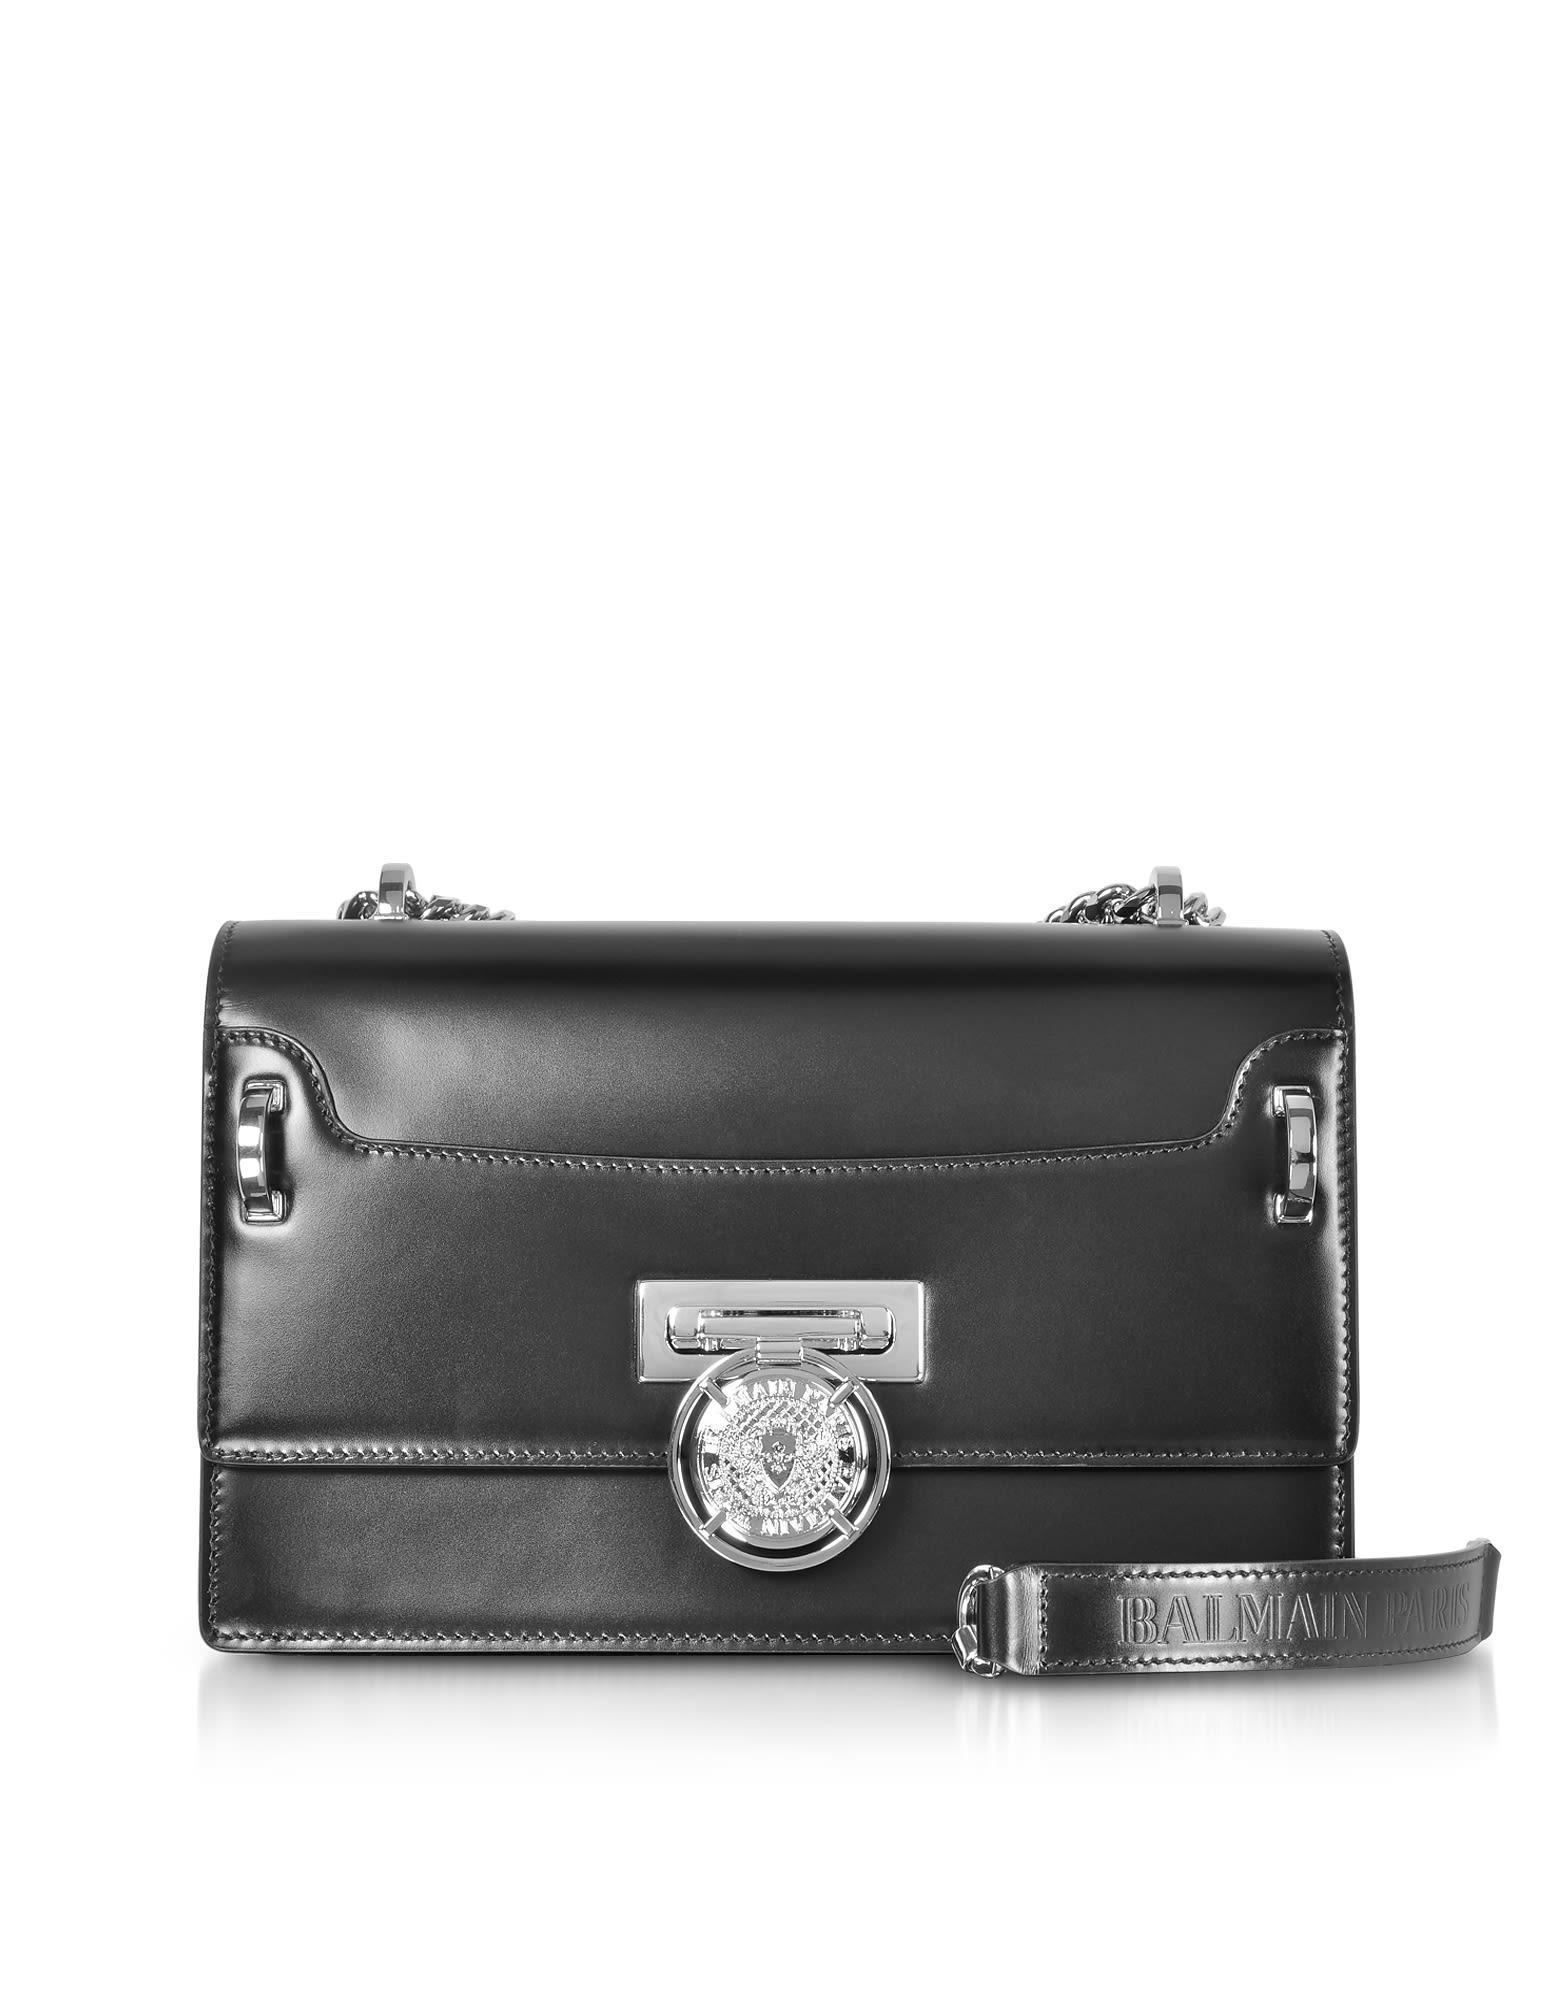 769e189725 Balmain Black Smooth Leather Bbox 25 Flap Shoulder Bag | ModeSens